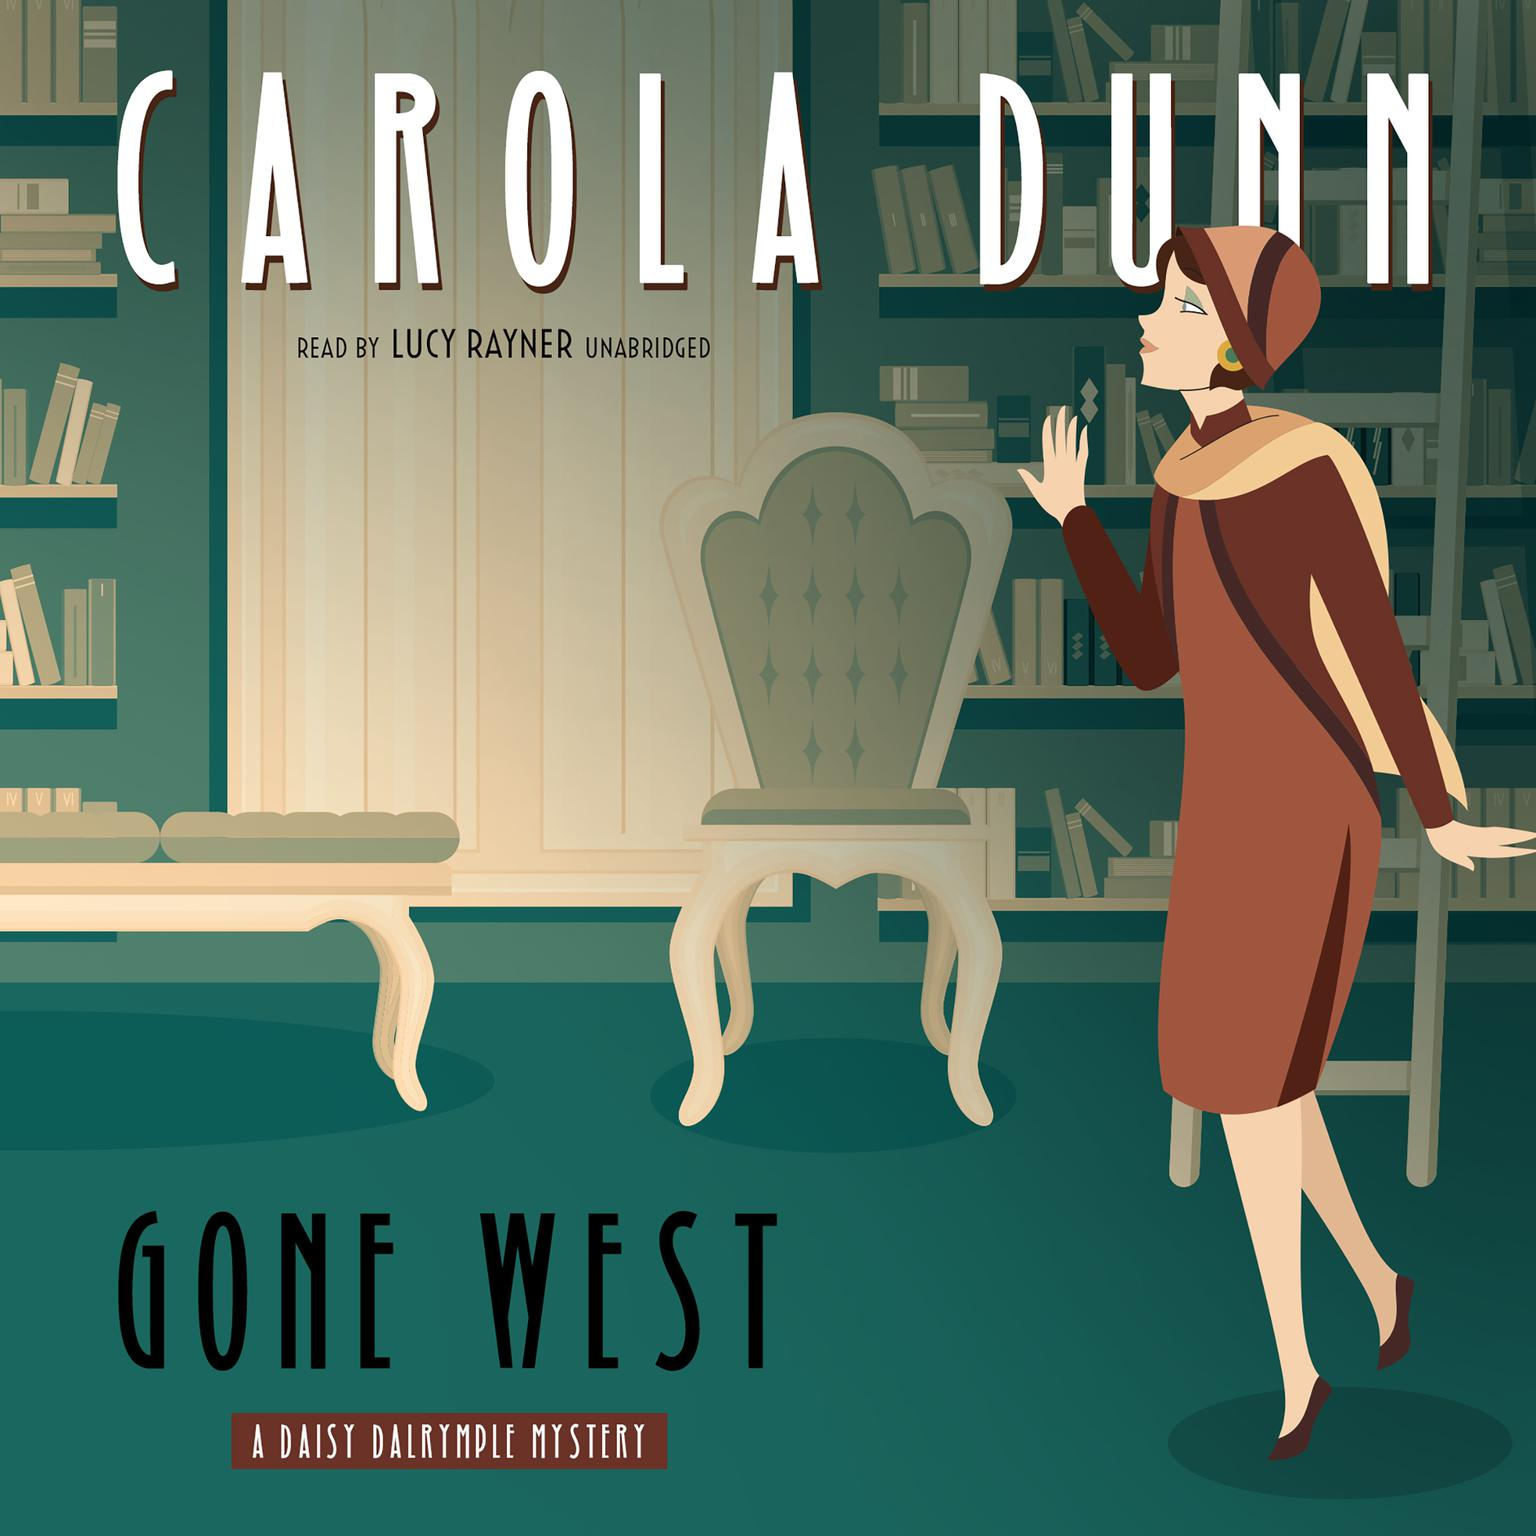 Gone West: A Daisy Dalrymple Mystery Audiobook, by Carola Dunn